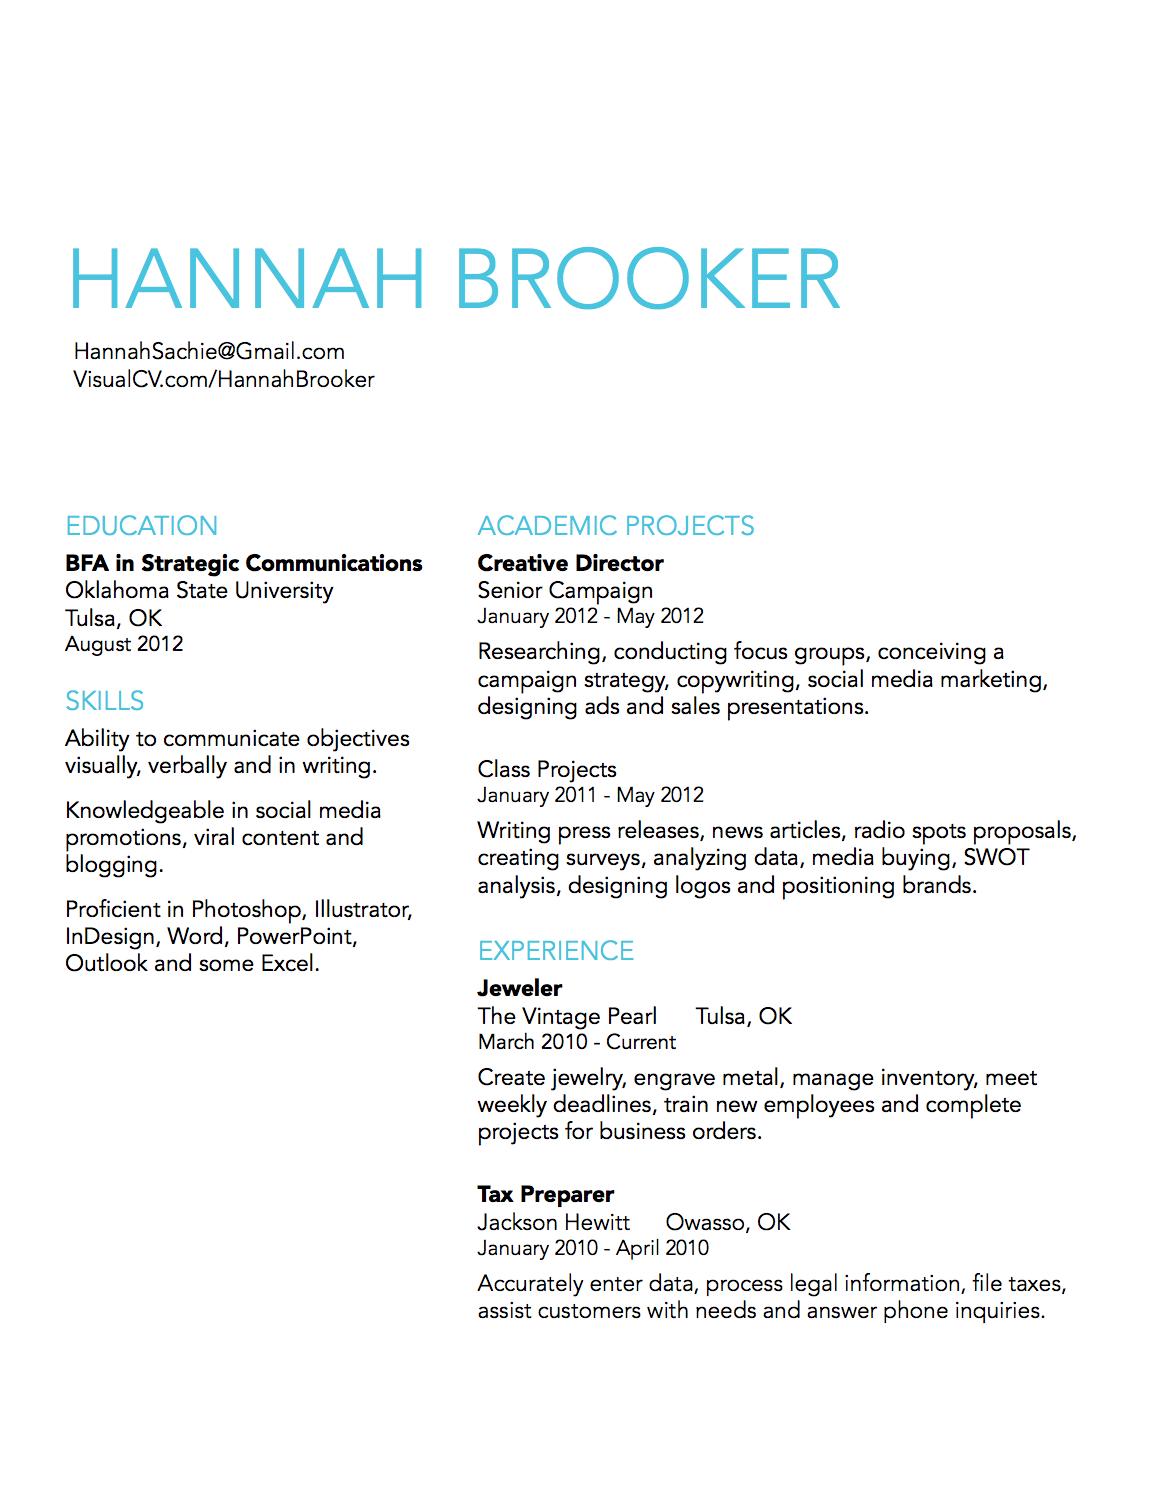 online writing lab resume